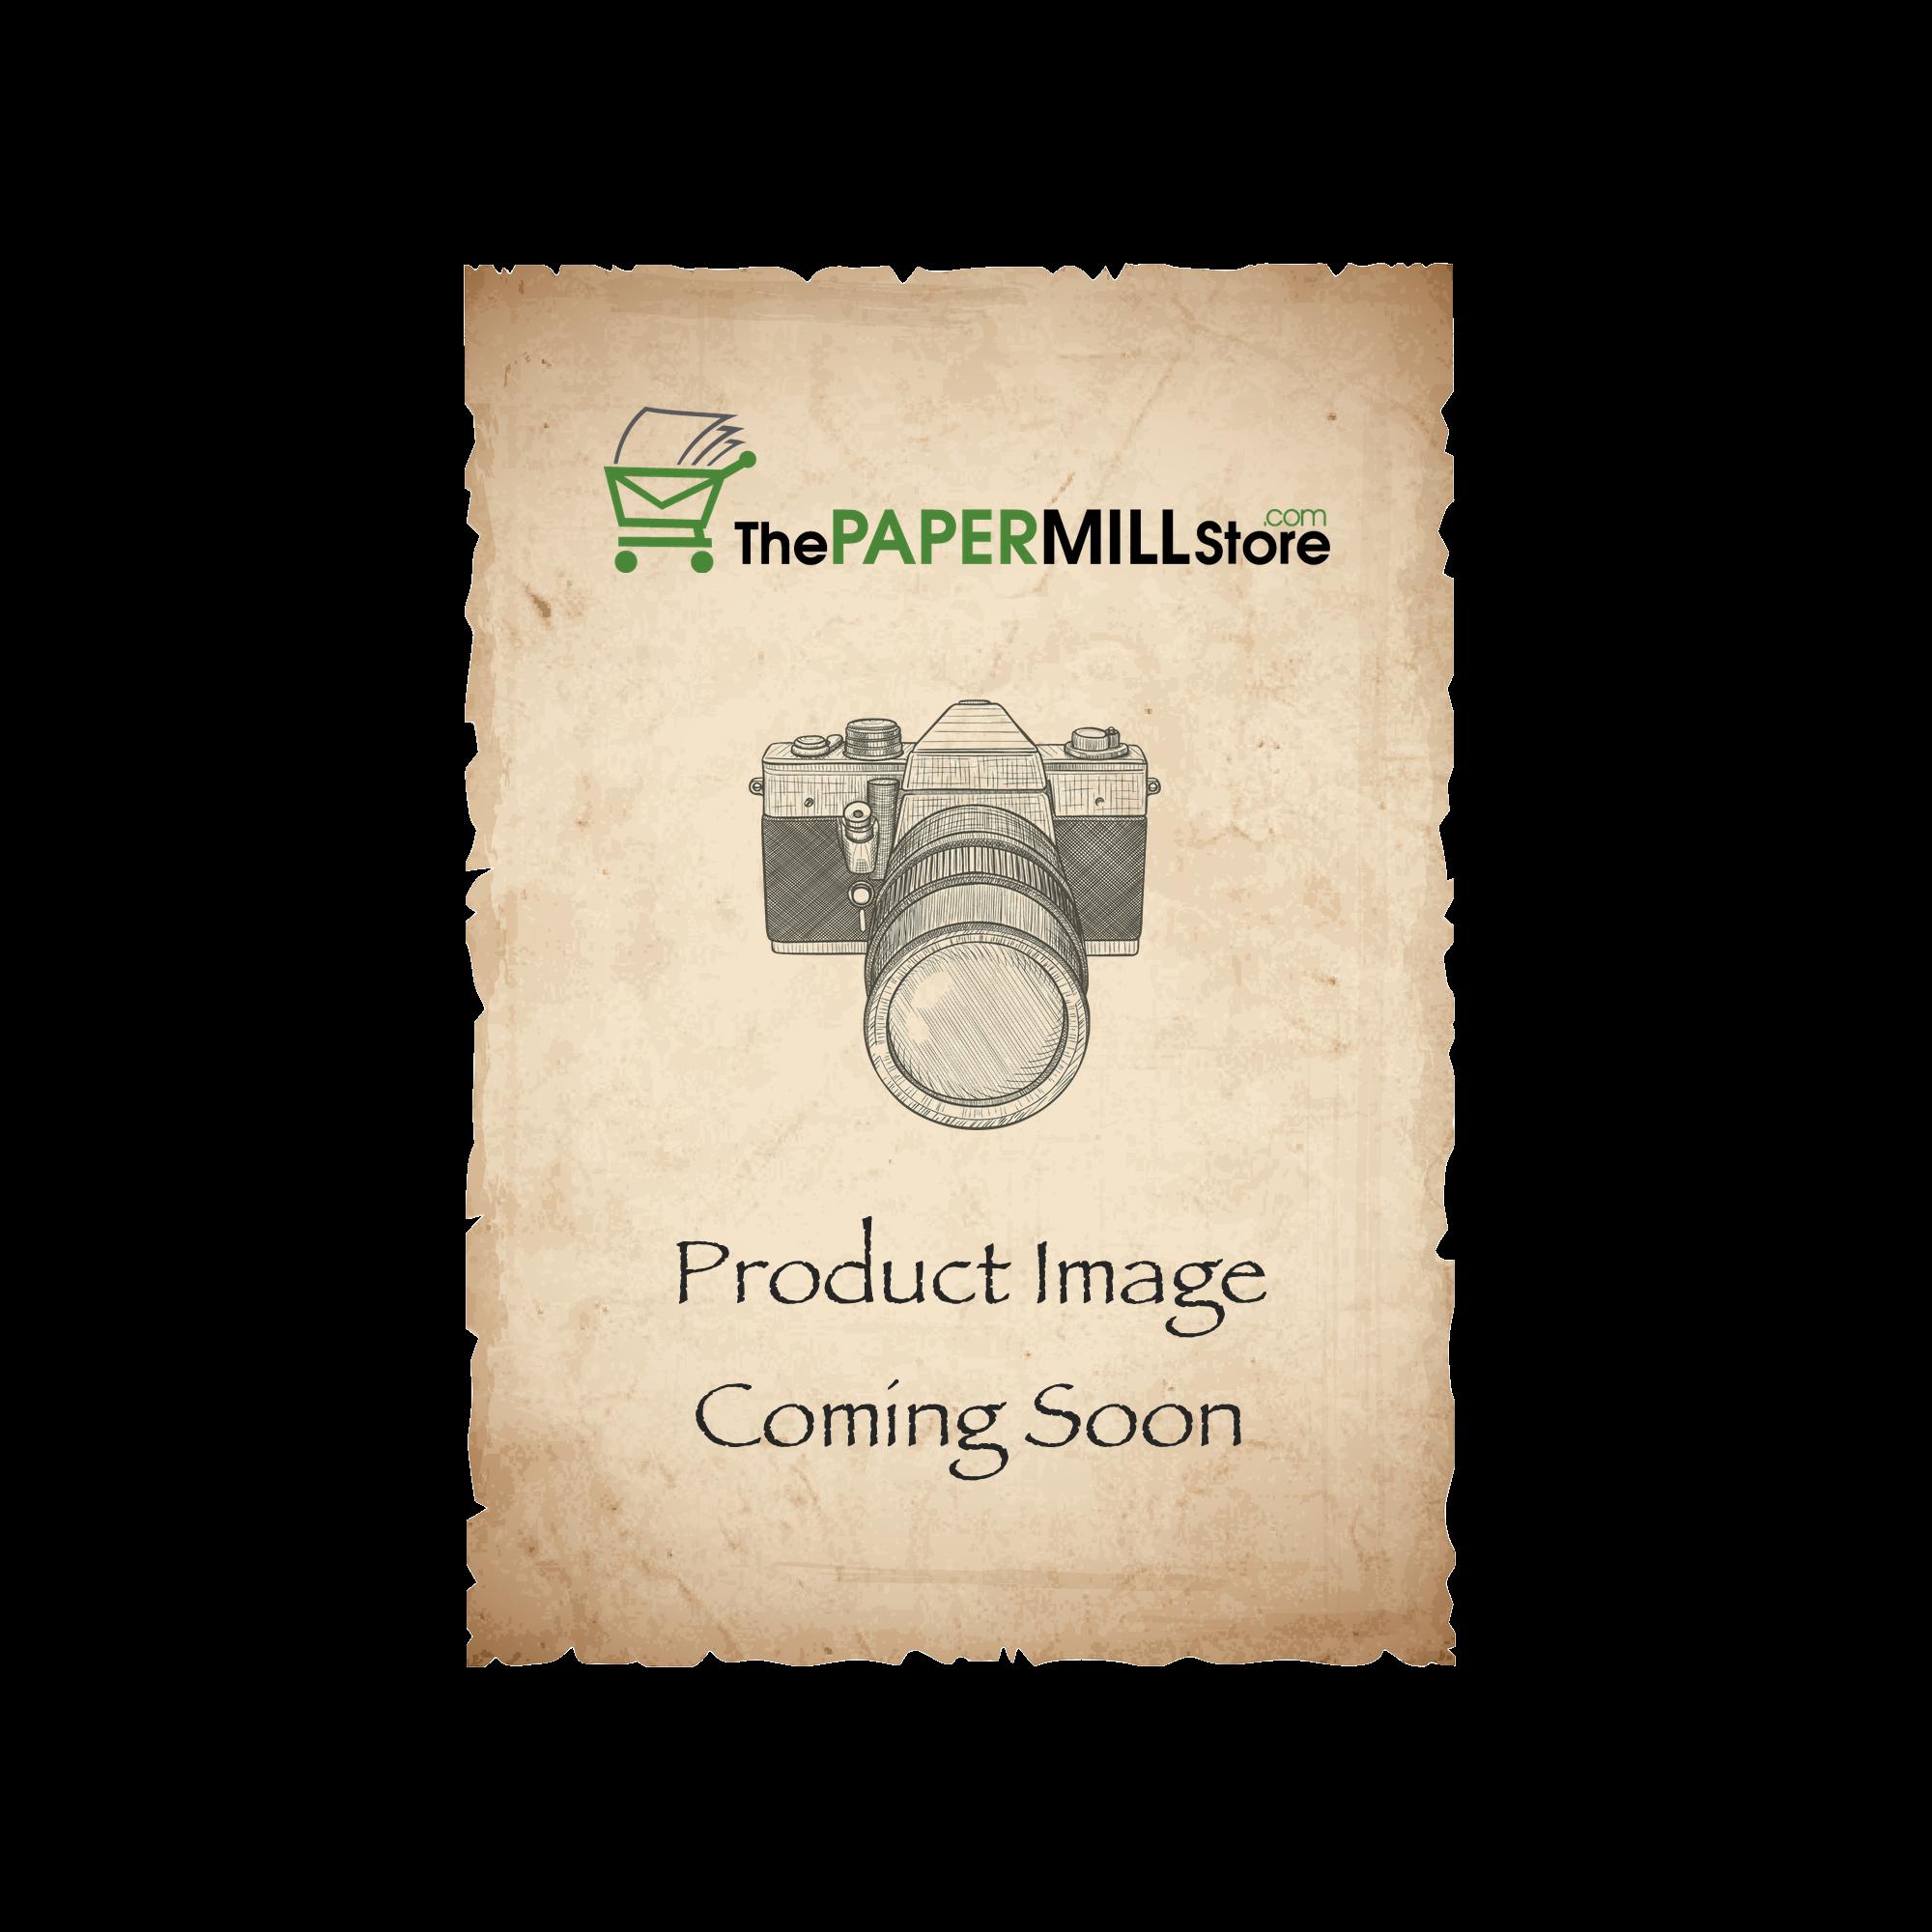 Cascata Pistachio Card Stock - 8 1/2 x 11 in 80 lb Cover Felt 25 per Package